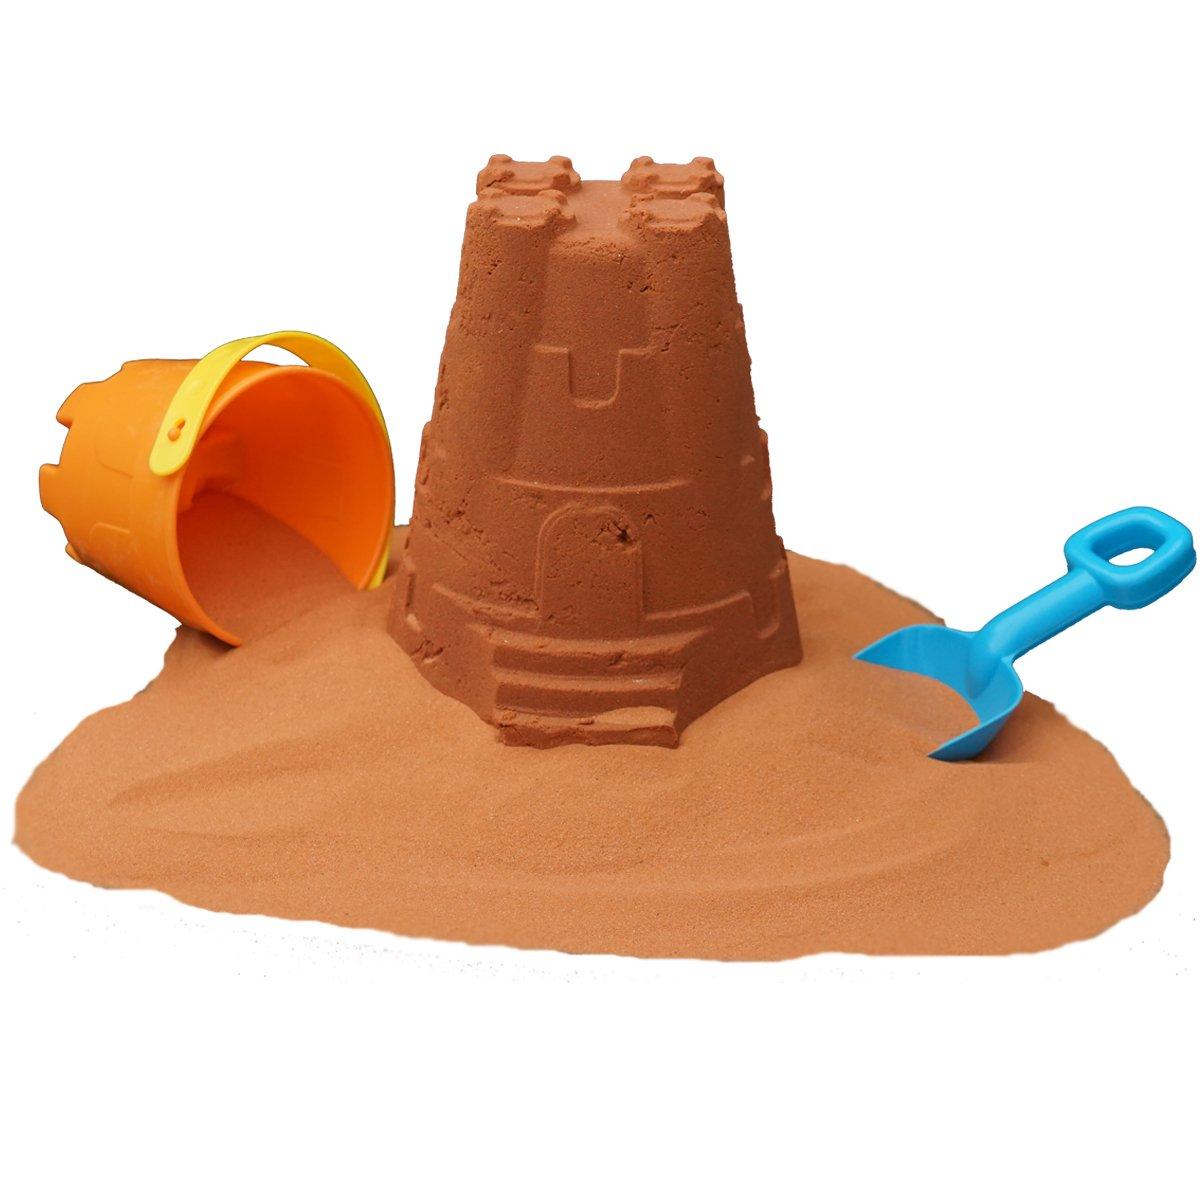 Original Jurassic Play Sand - 50 Pound Sandbox Sand by Jurassic Sands